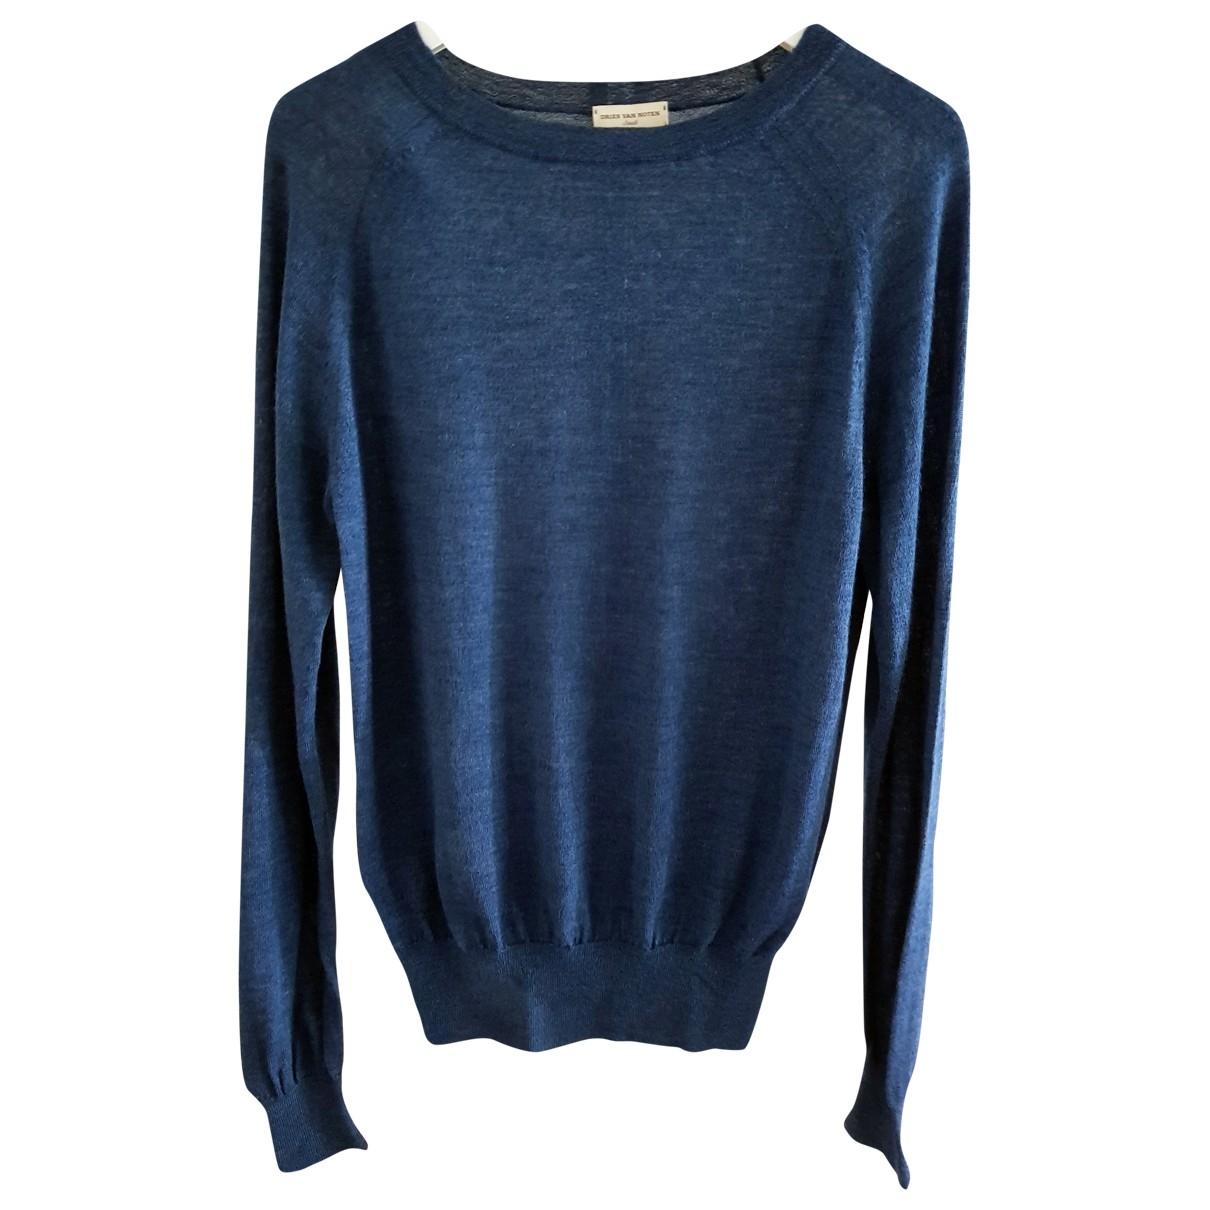 Dries Van Noten \N Blue Wool Knitwear & Sweatshirts for Men S International